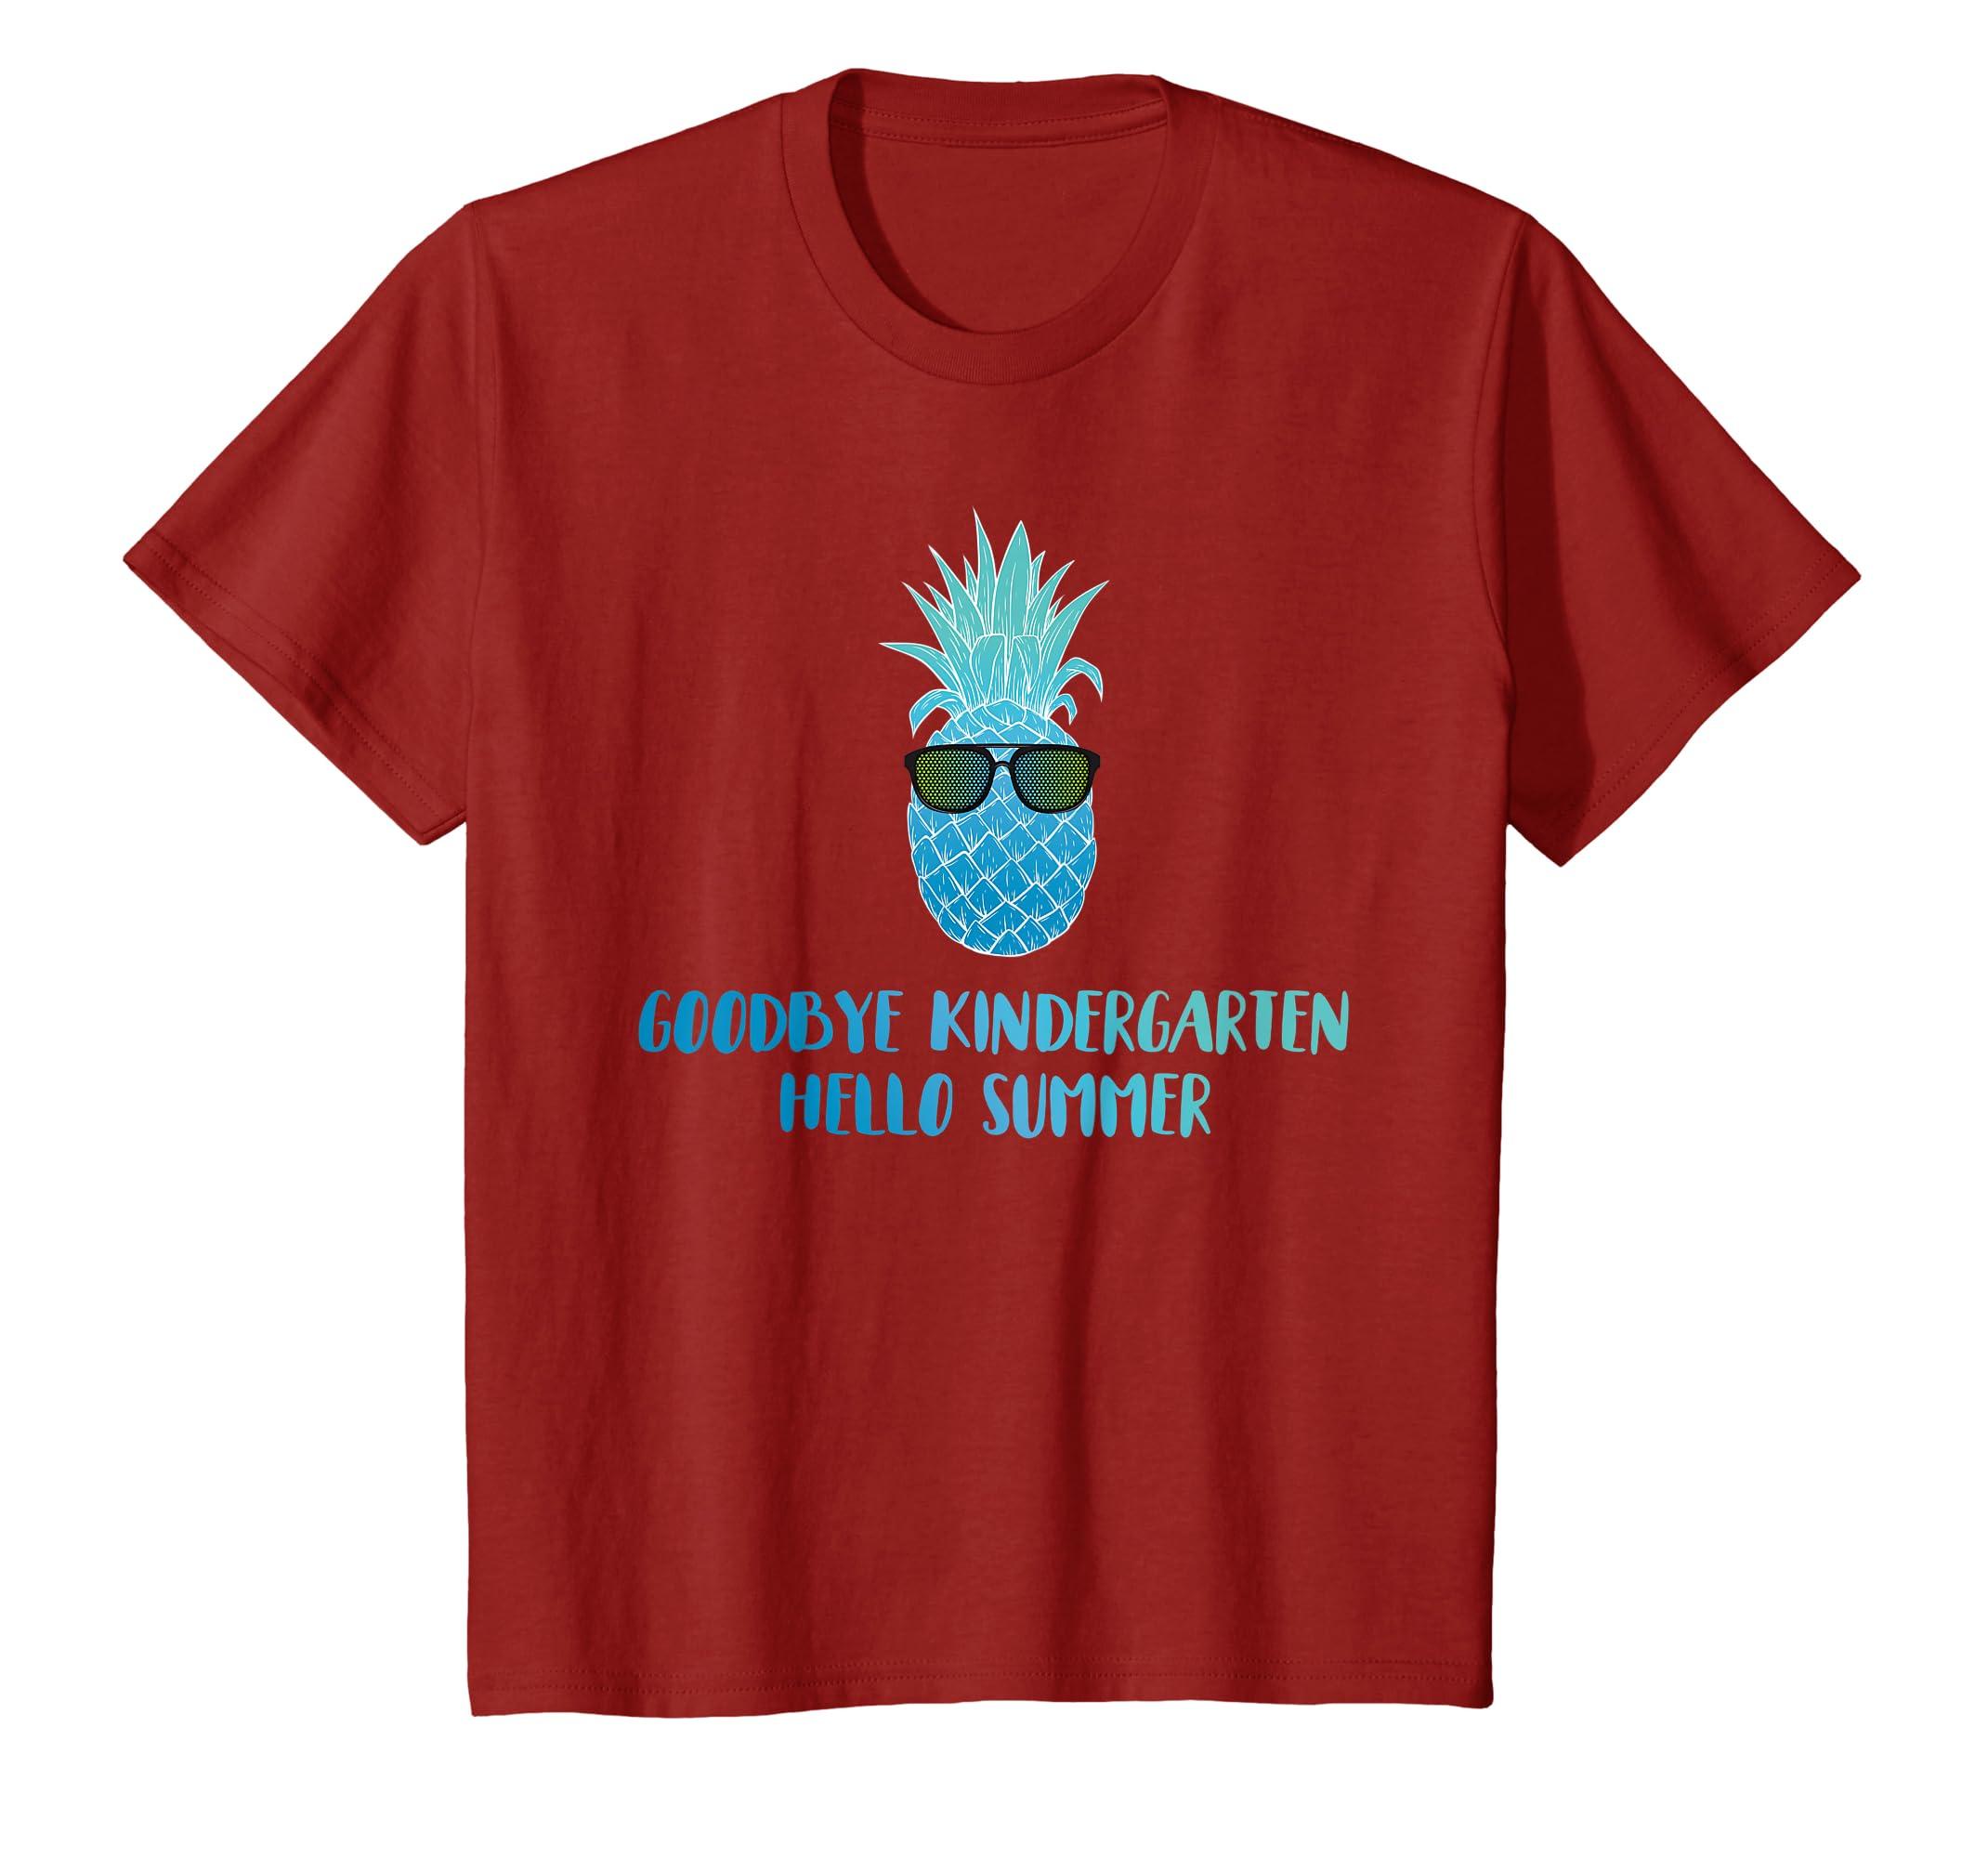 0980b0fdb58 Amazon.com  Goodbye Kindergarten Hello Summer Last Day Teacher T Shirt   Clothing